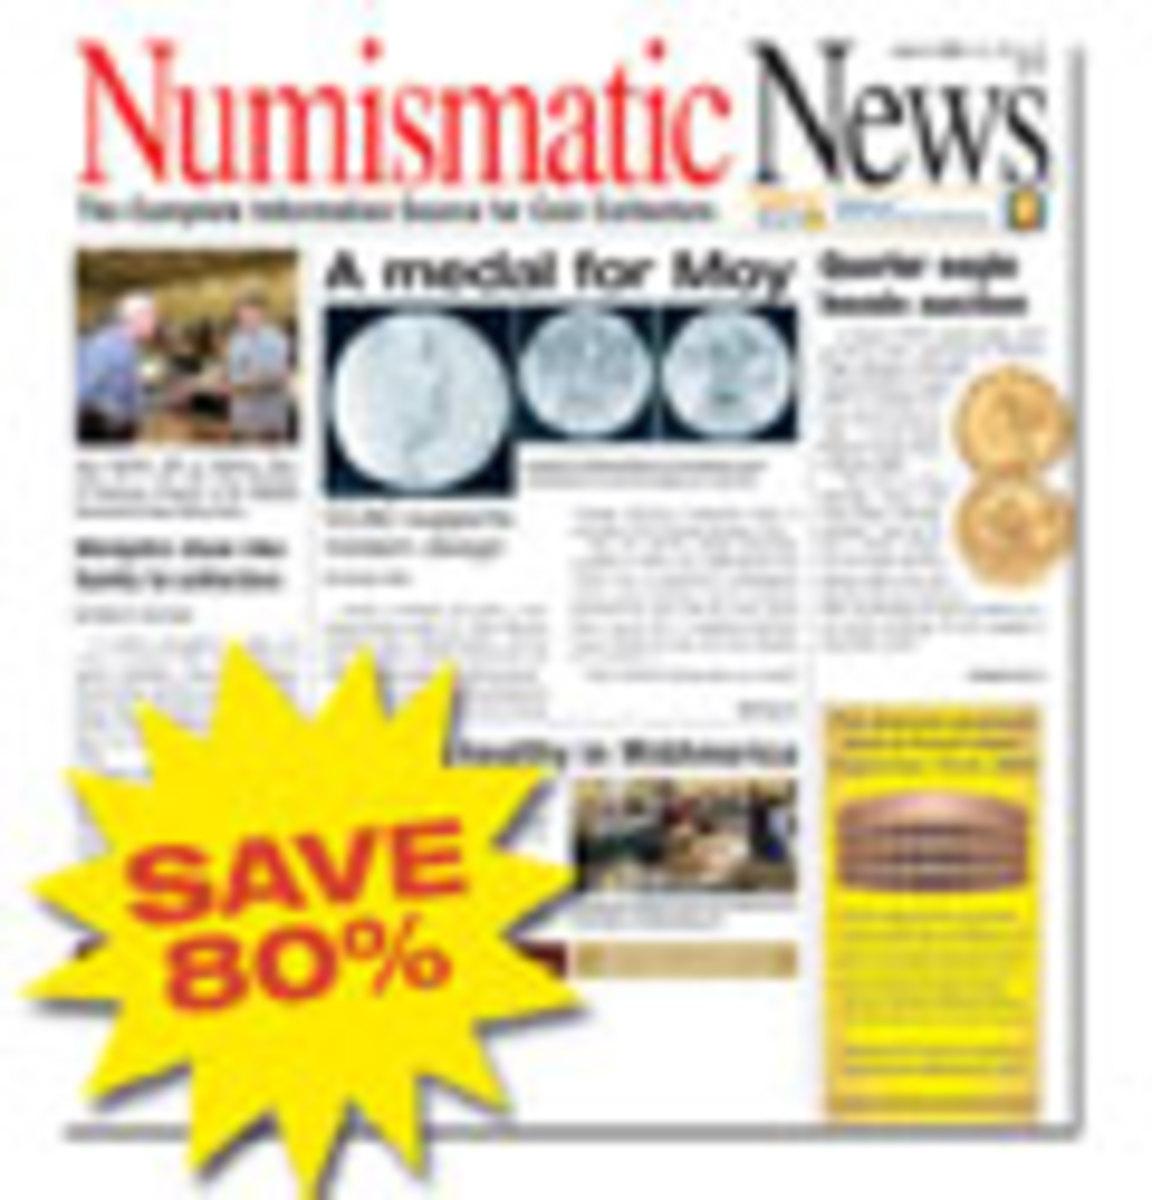 Numismatic News Magazine One Year Subscription - U.S.